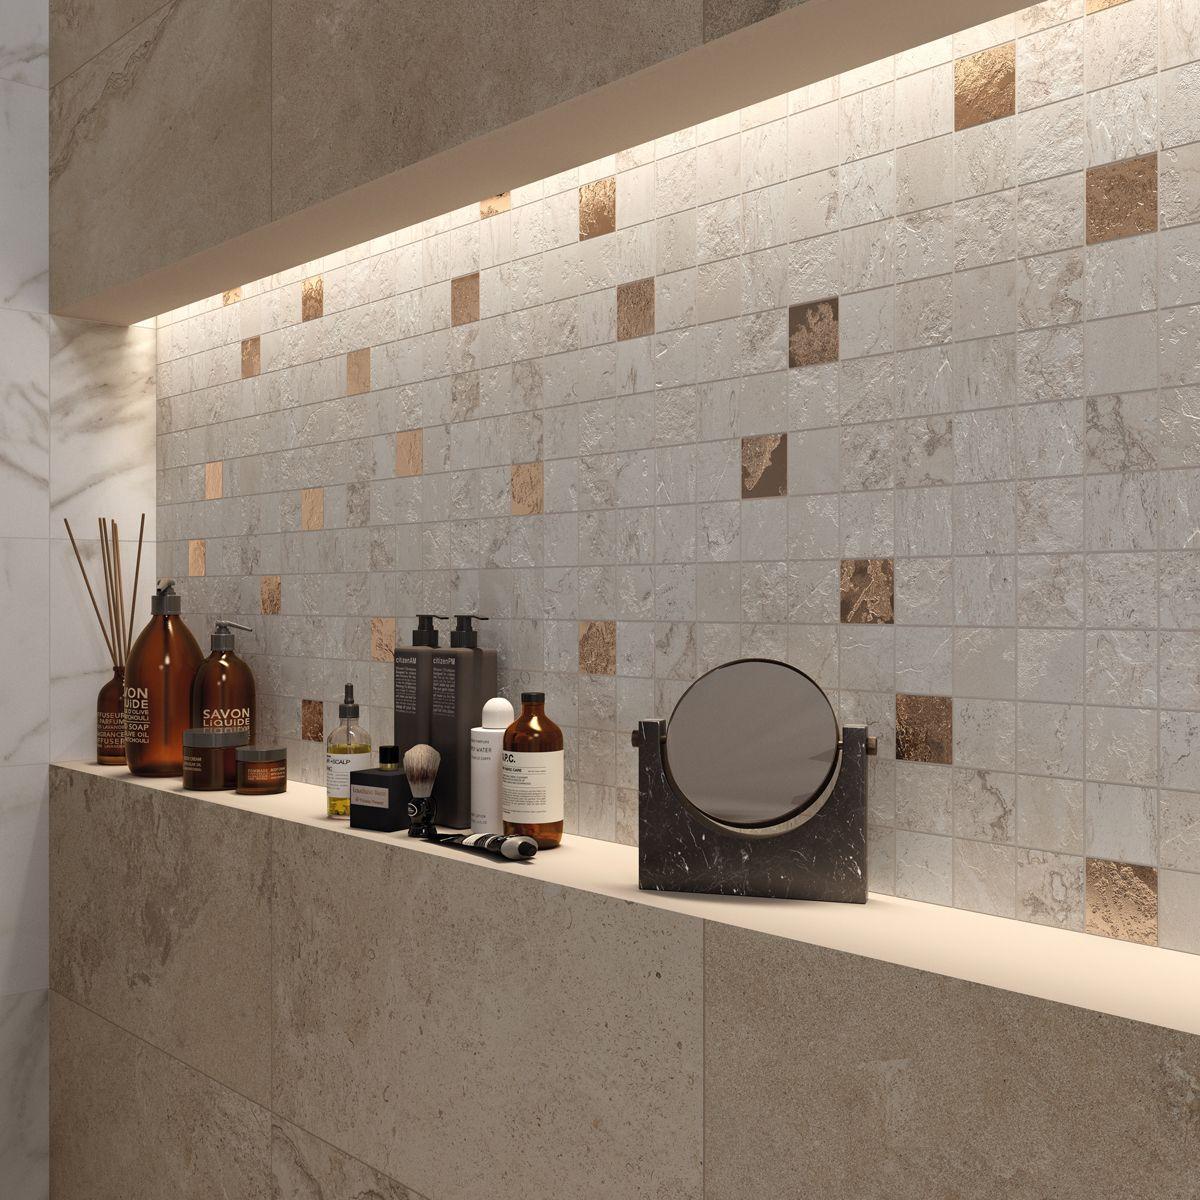 Alpes raw mosaico quadretti glam ivory rende preziosa la nicchia alpes raw mosaico quadretti glam ivory rende preziosa la nicchia nella parete rivestita con alpes raw ceramic tile dailygadgetfo Gallery